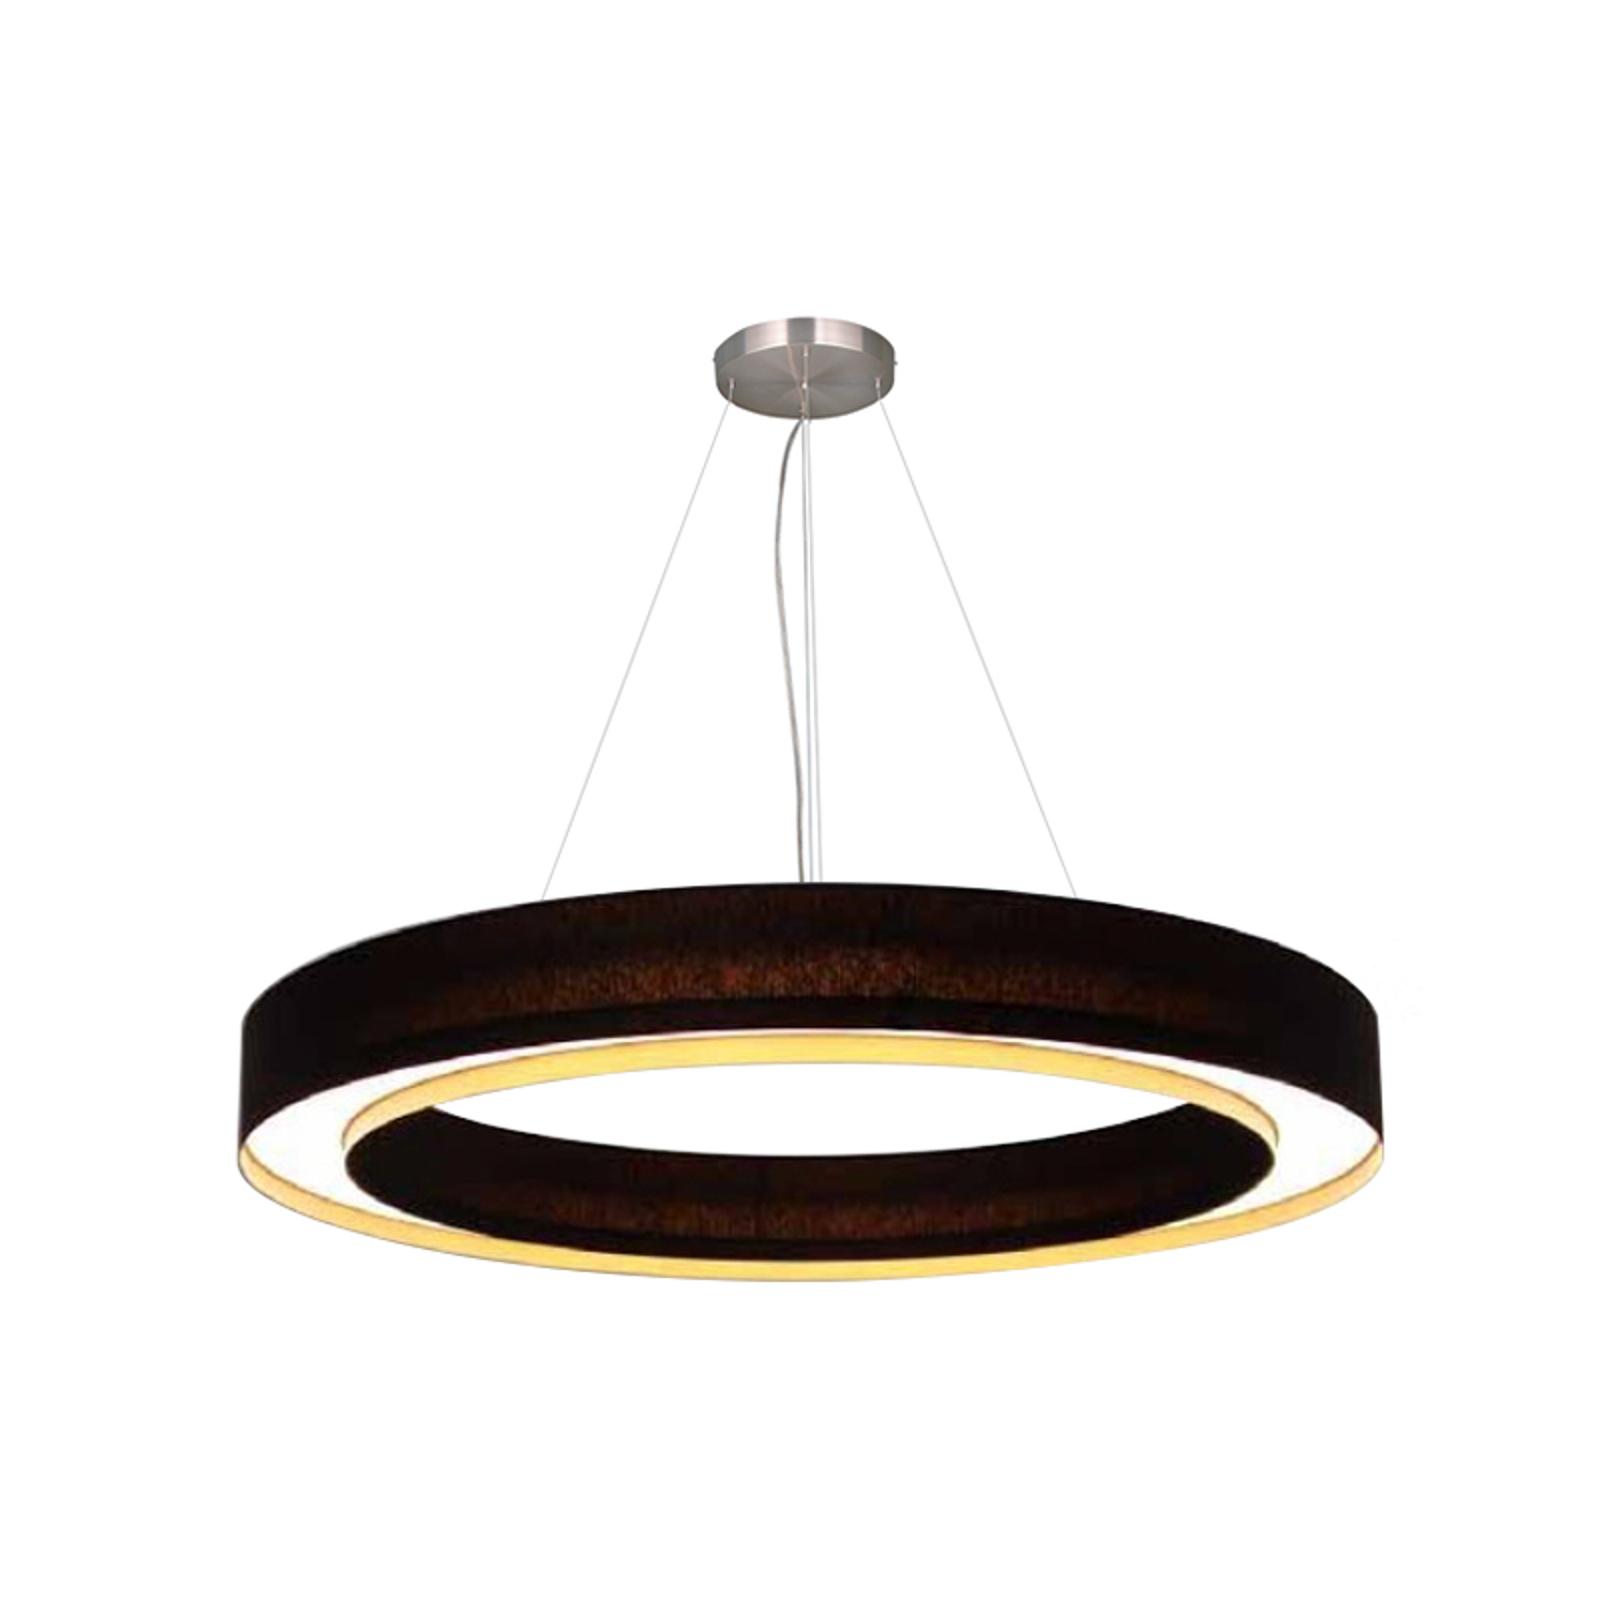 Ringvormige LED hanglamp Cloud, 48 cm